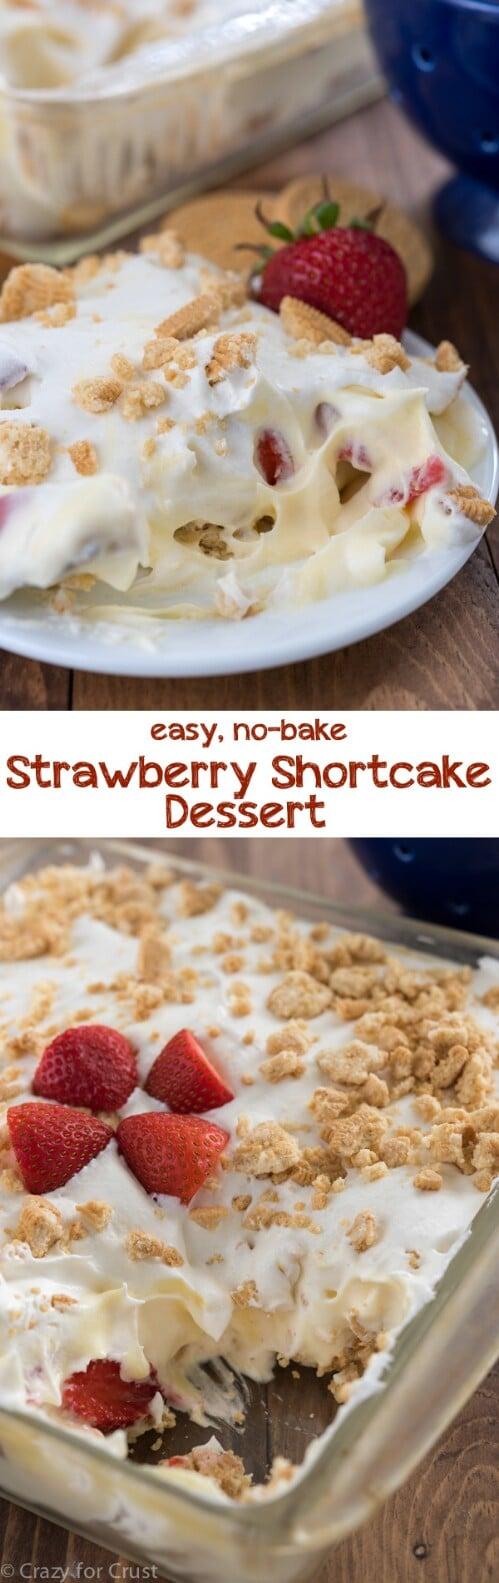 No Bake Strawberry Shortcake Dessert